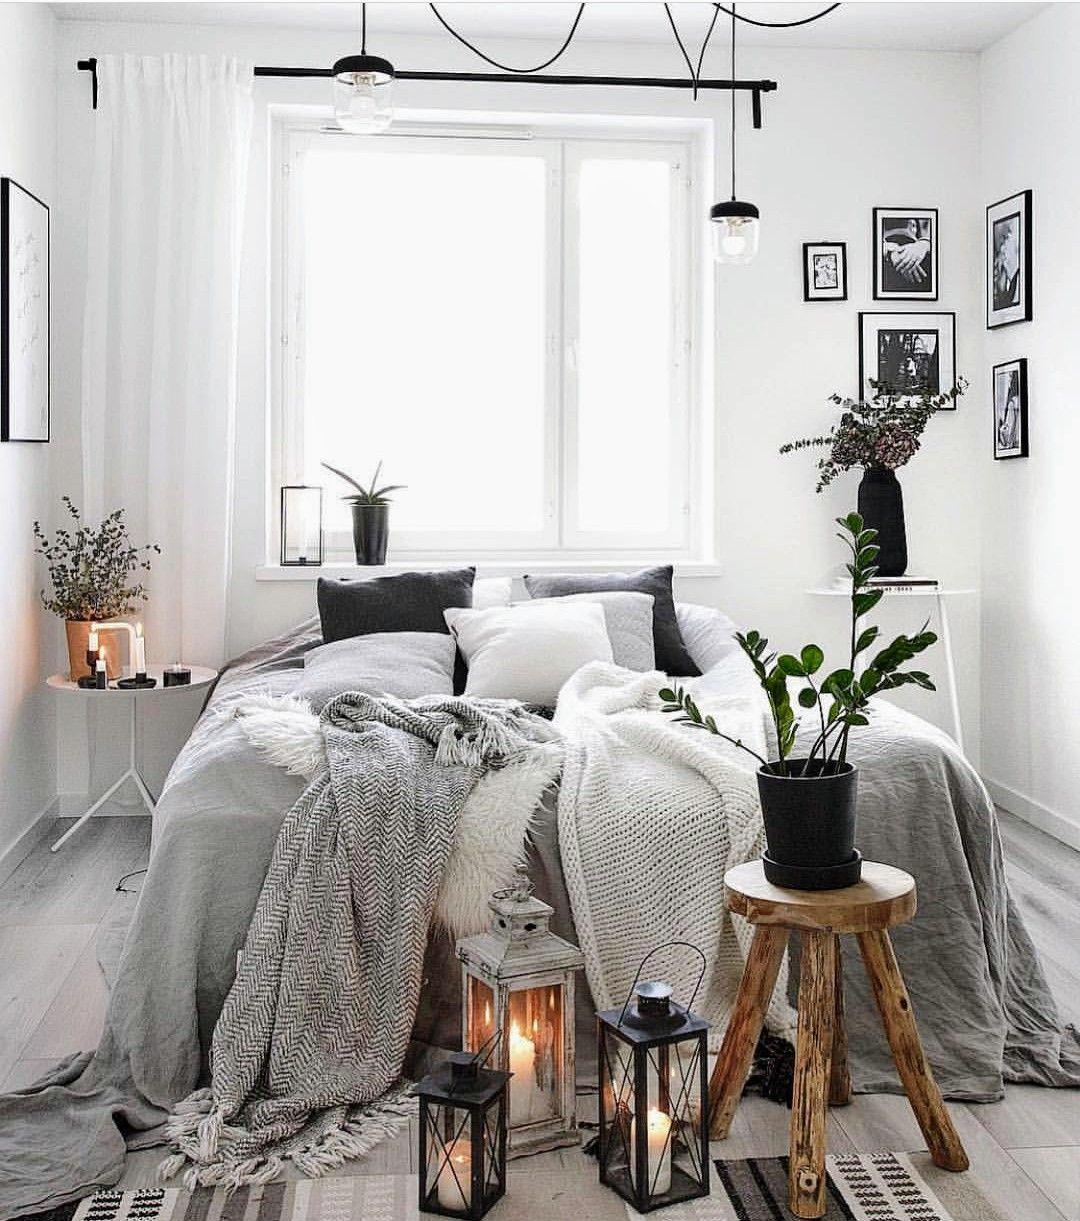 #home #homedecor #living #style #lifestyle #luxury #luxurylifestyle #interiordesign #design #bedroomgoals